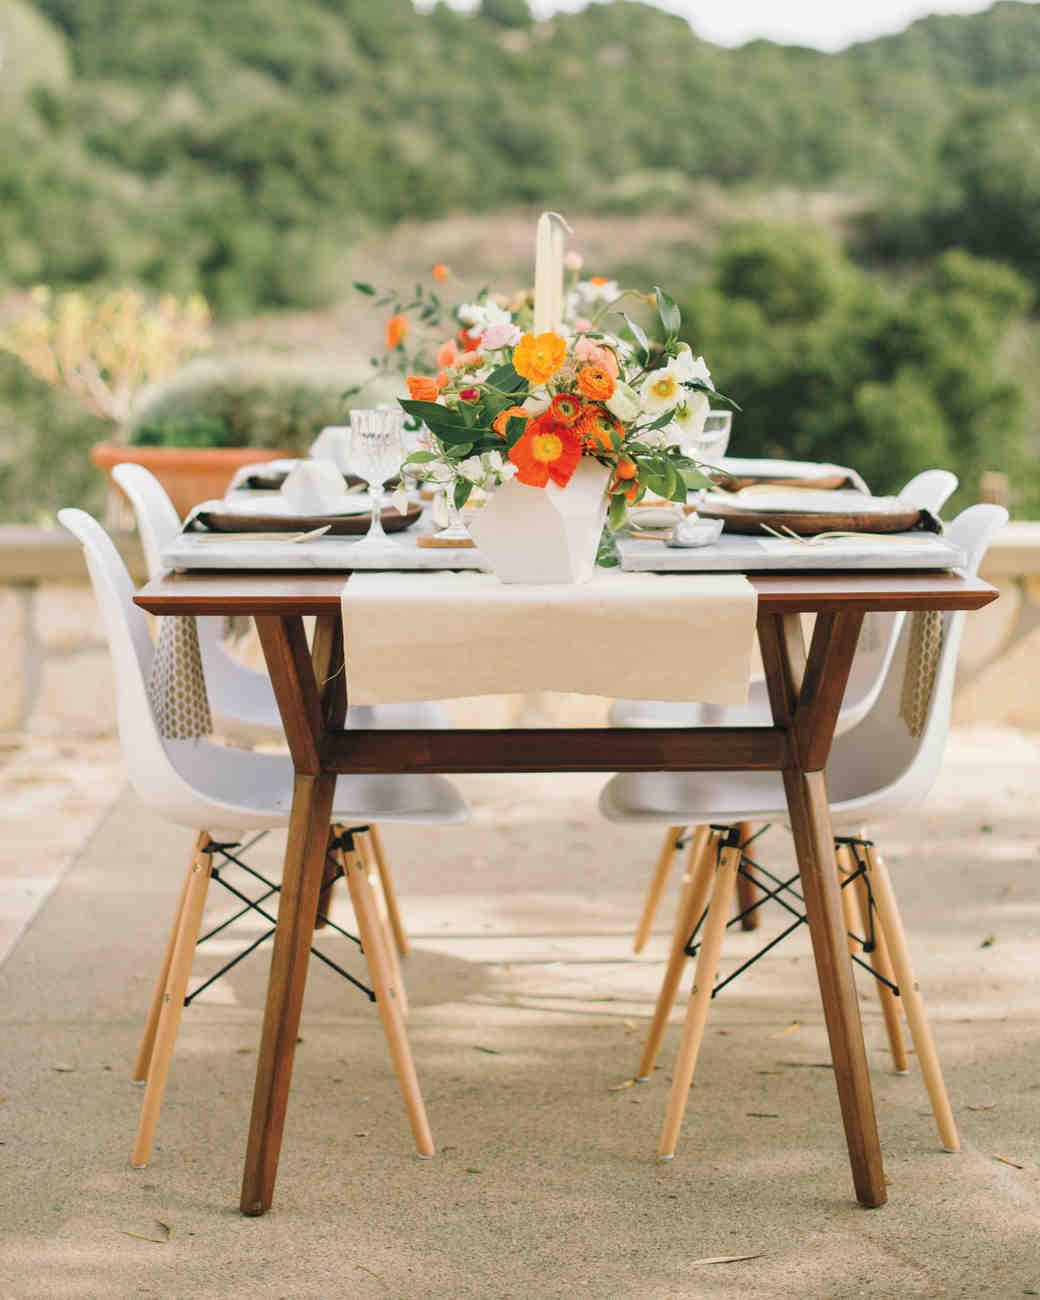 carlie-gabe-wedding-vow-renewal-092dm1-4665-s111570.jpg